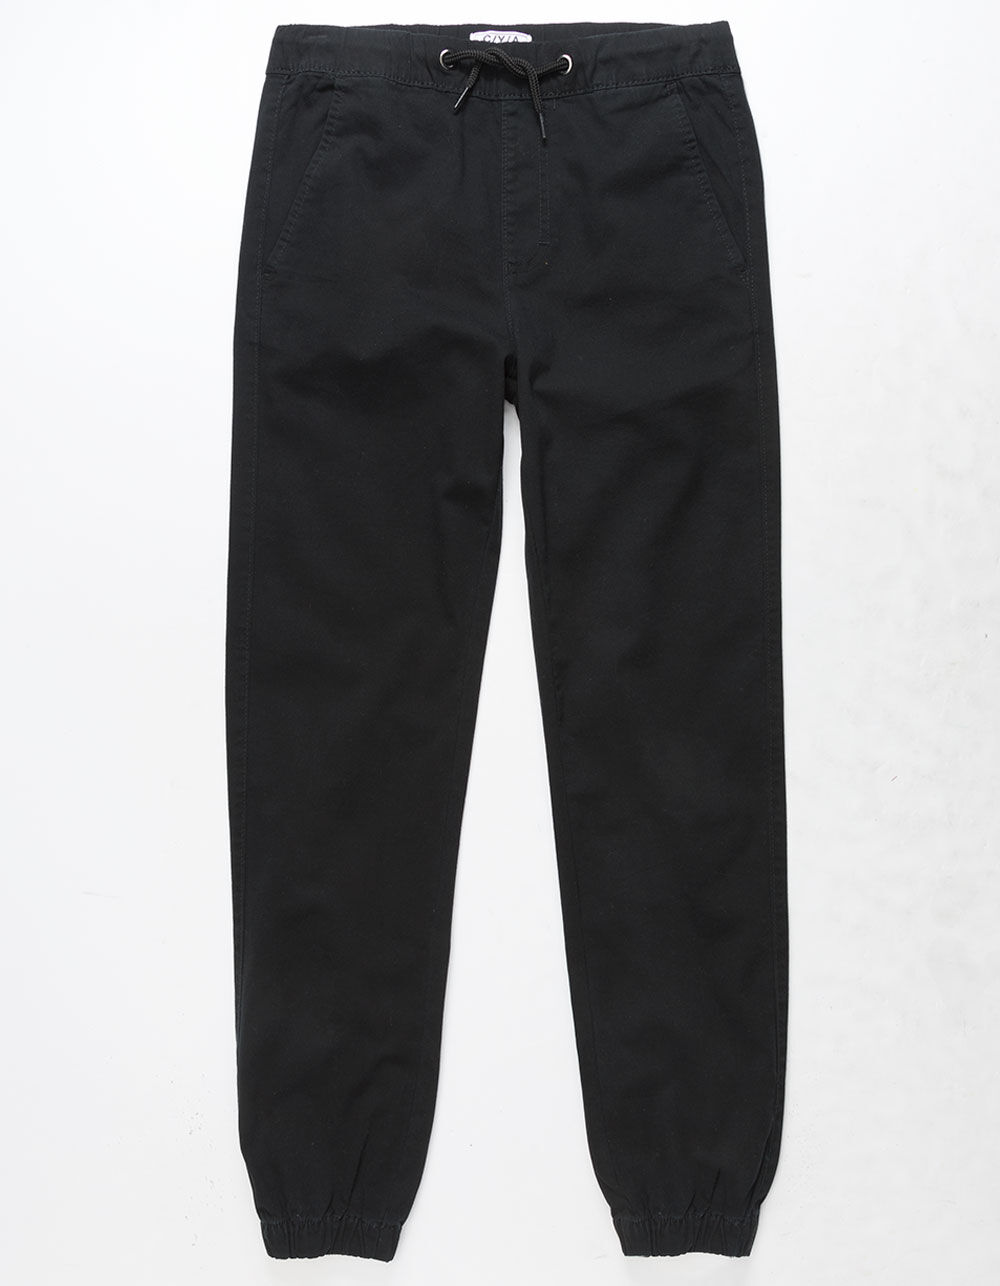 Image of CYA CHAD BLACK BOYS JOGGER PANTS